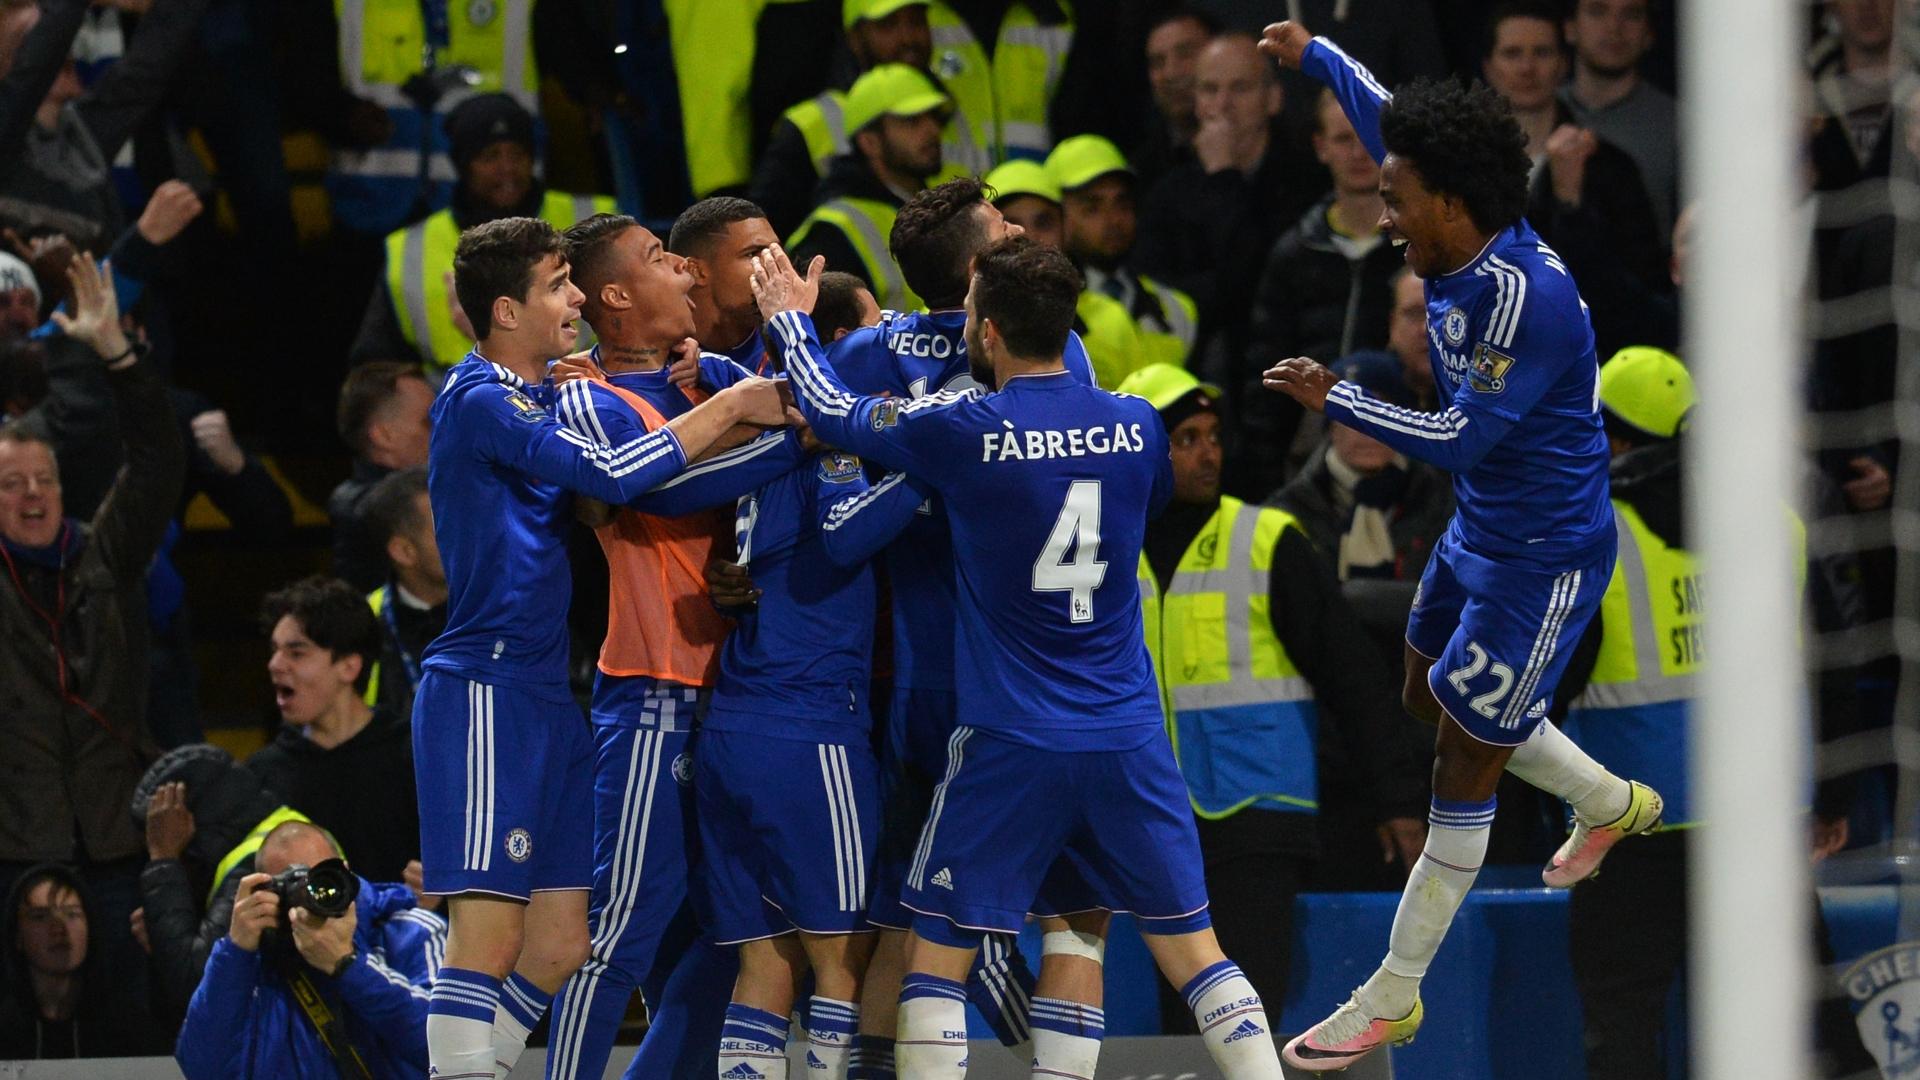 Chelsea 2-2 Tottenham: Hazard Hands Leicester The Title